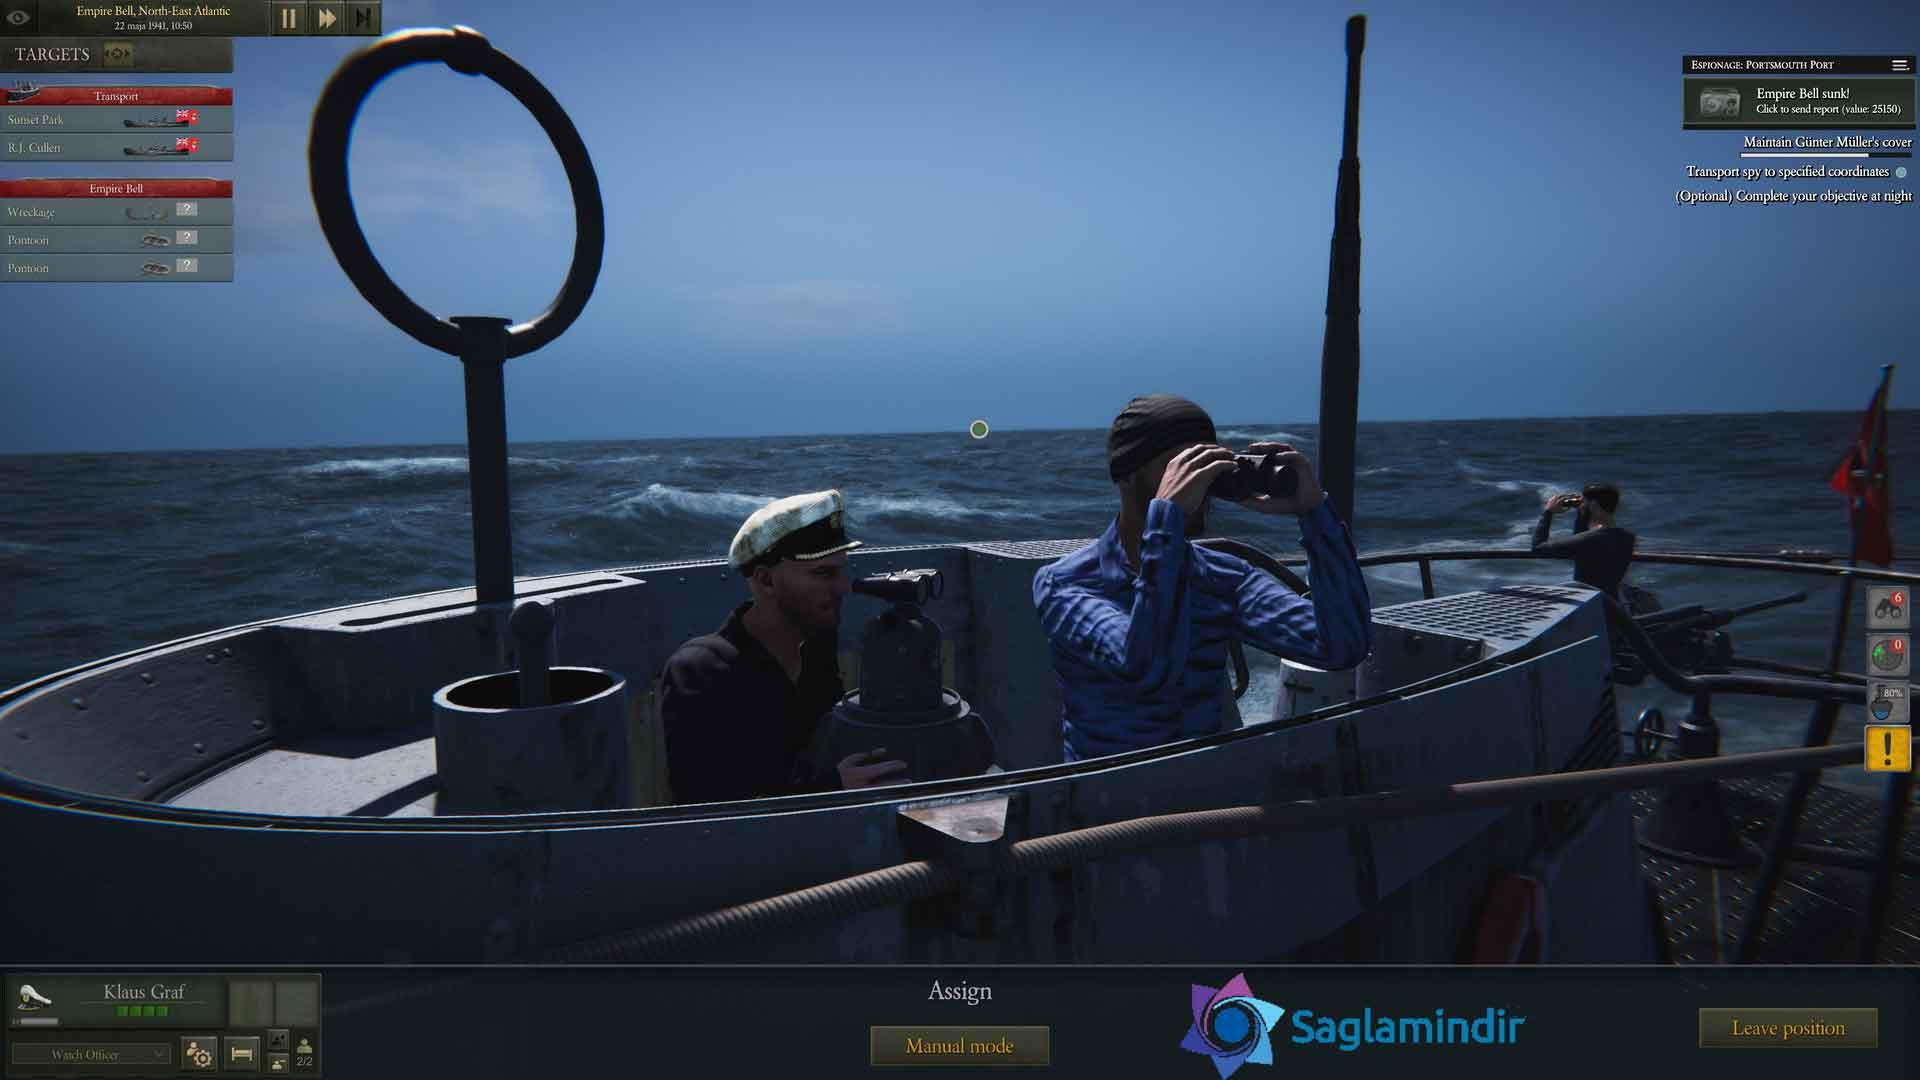 Uboat-saglamindir